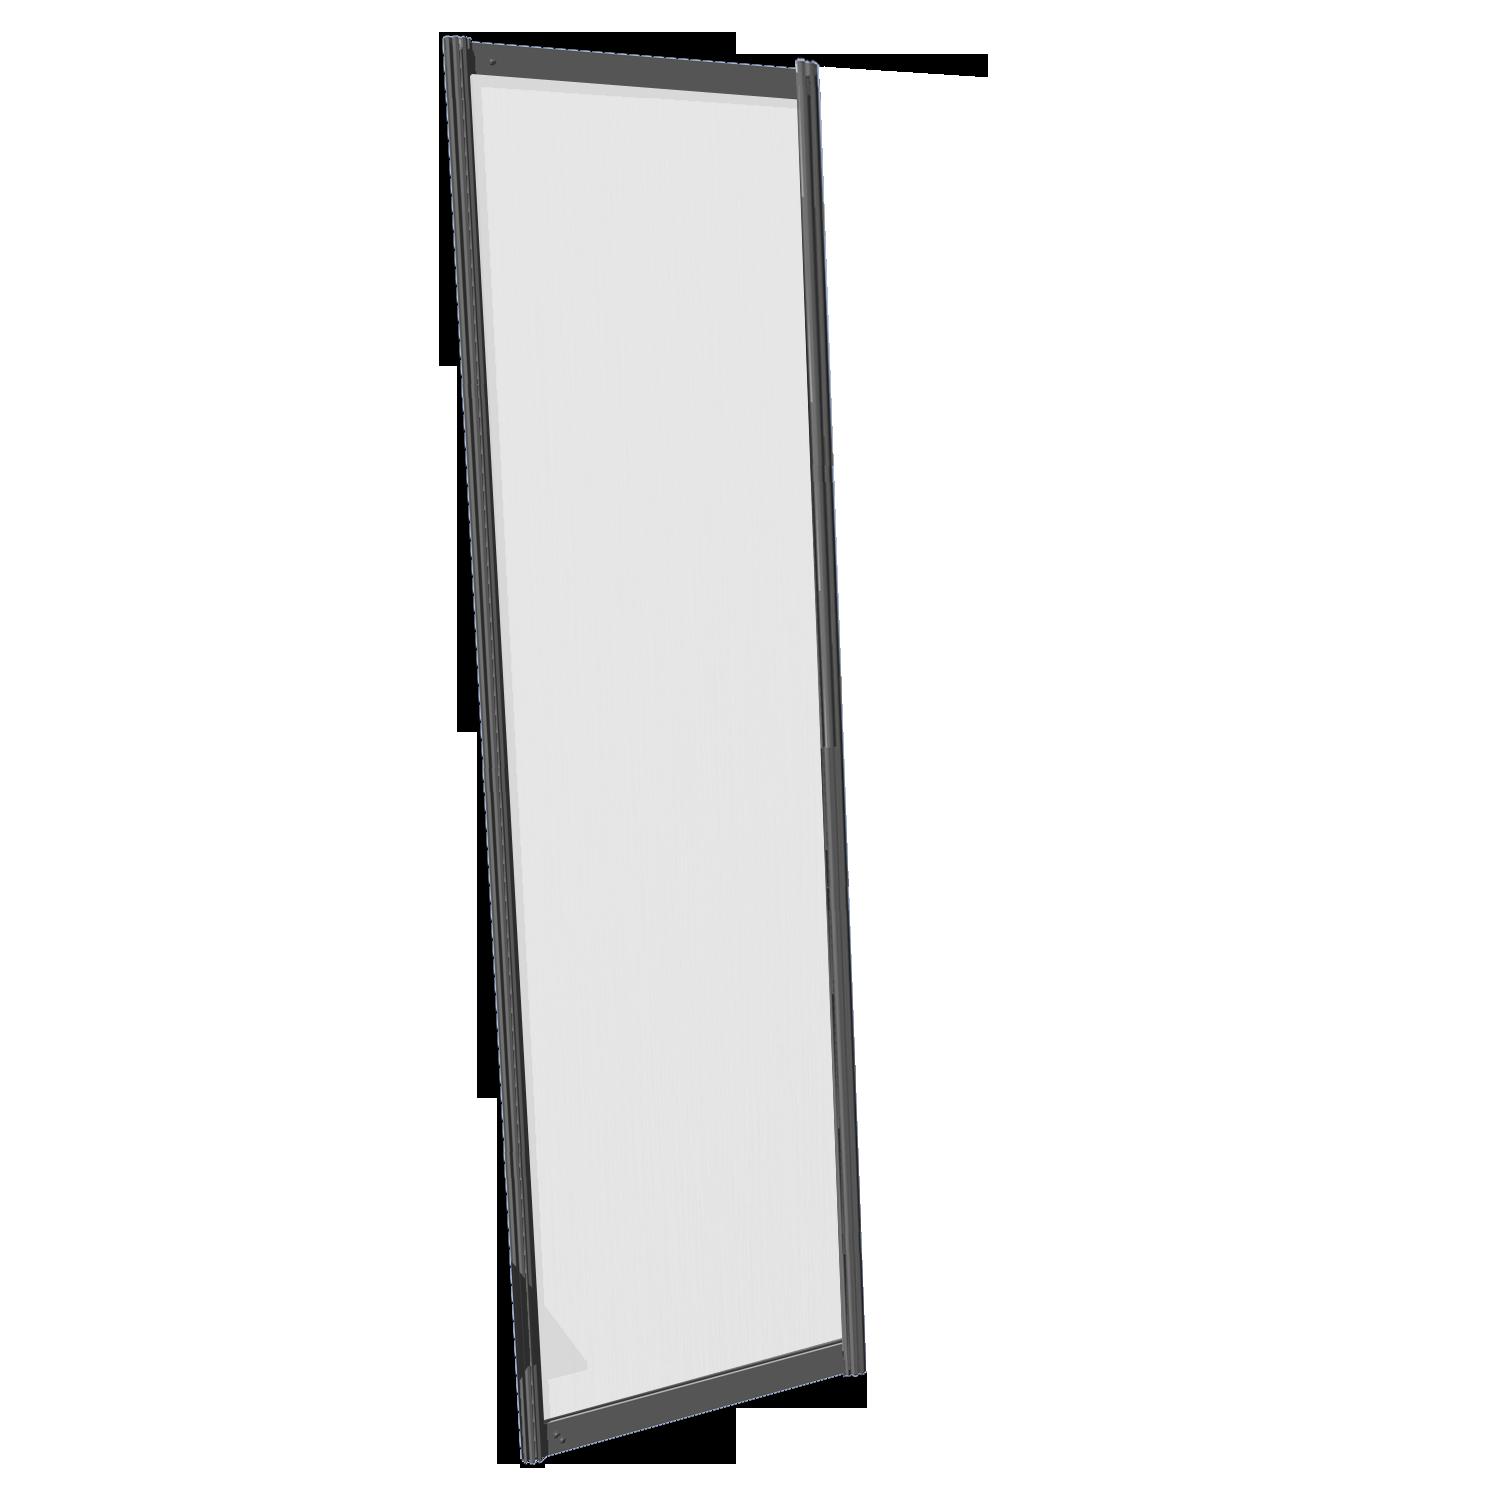 Stellwand / Trennwand / Rückwand 50cm